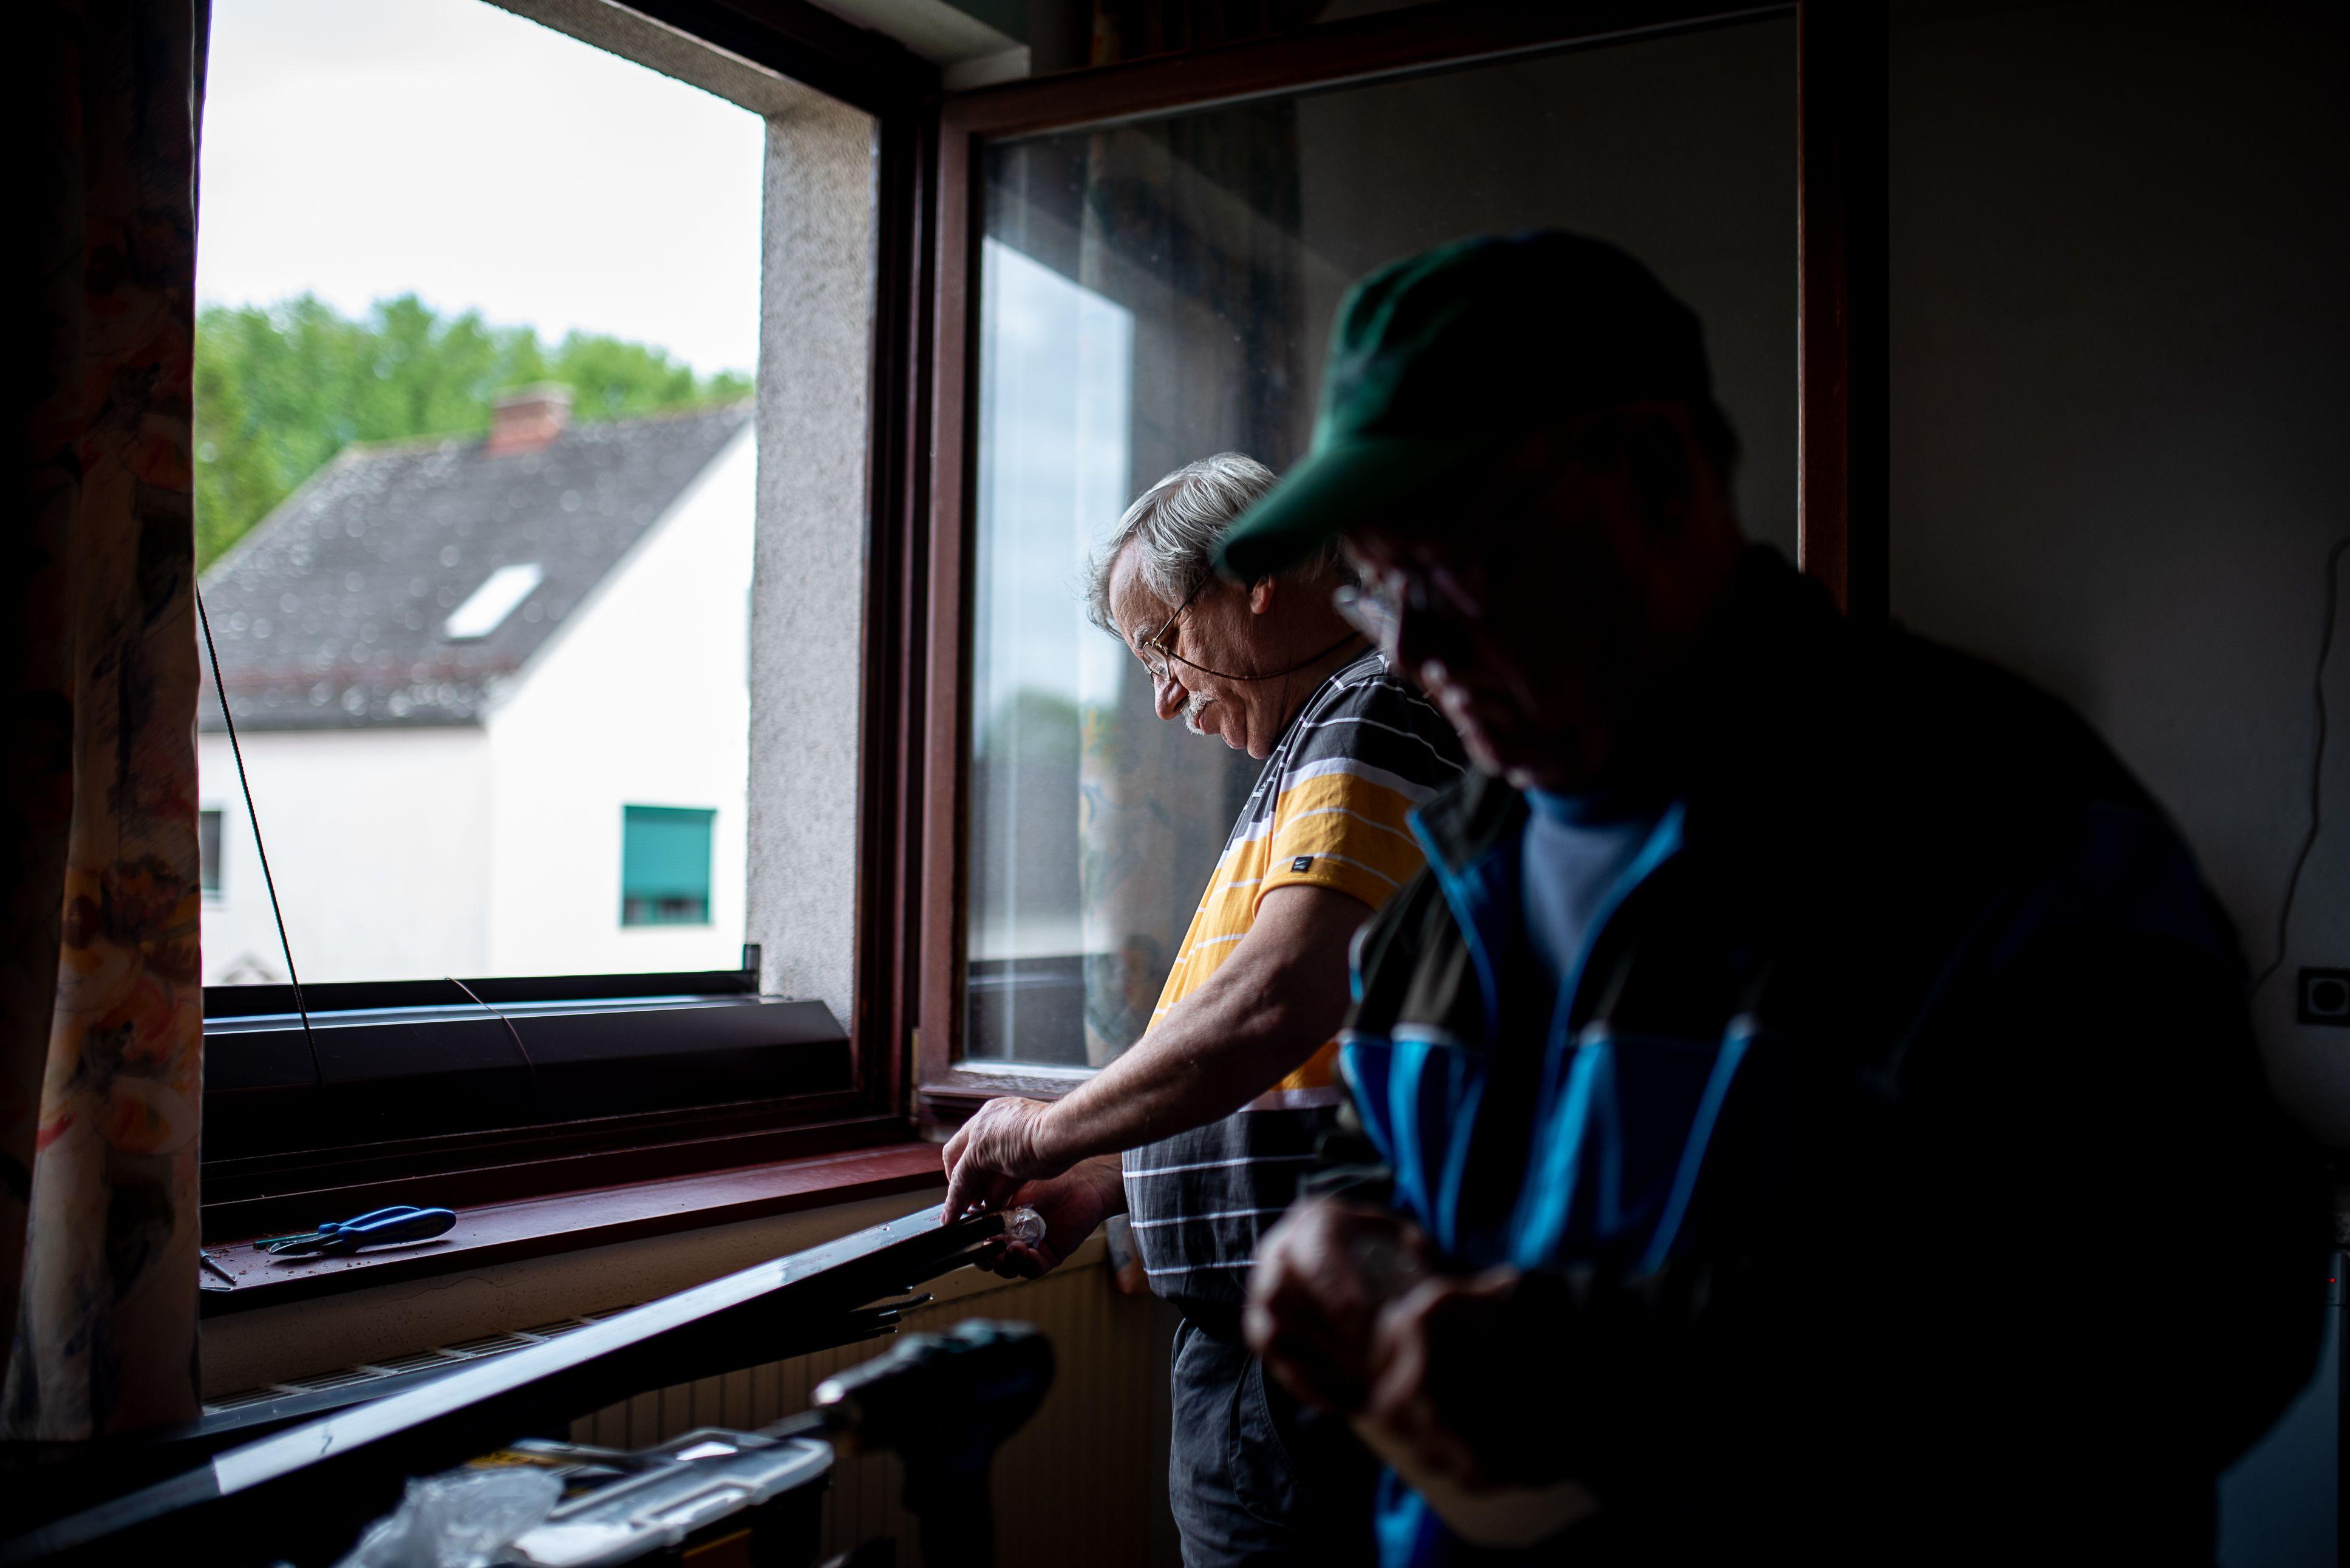 Image: 73895423, Sopron - riport az Ausztriába ingázó munkavállalókról, Place: Sopron, Hungary, Model Release: No or not aplicable, Property Release: Yes, Credit: smagpictures.com